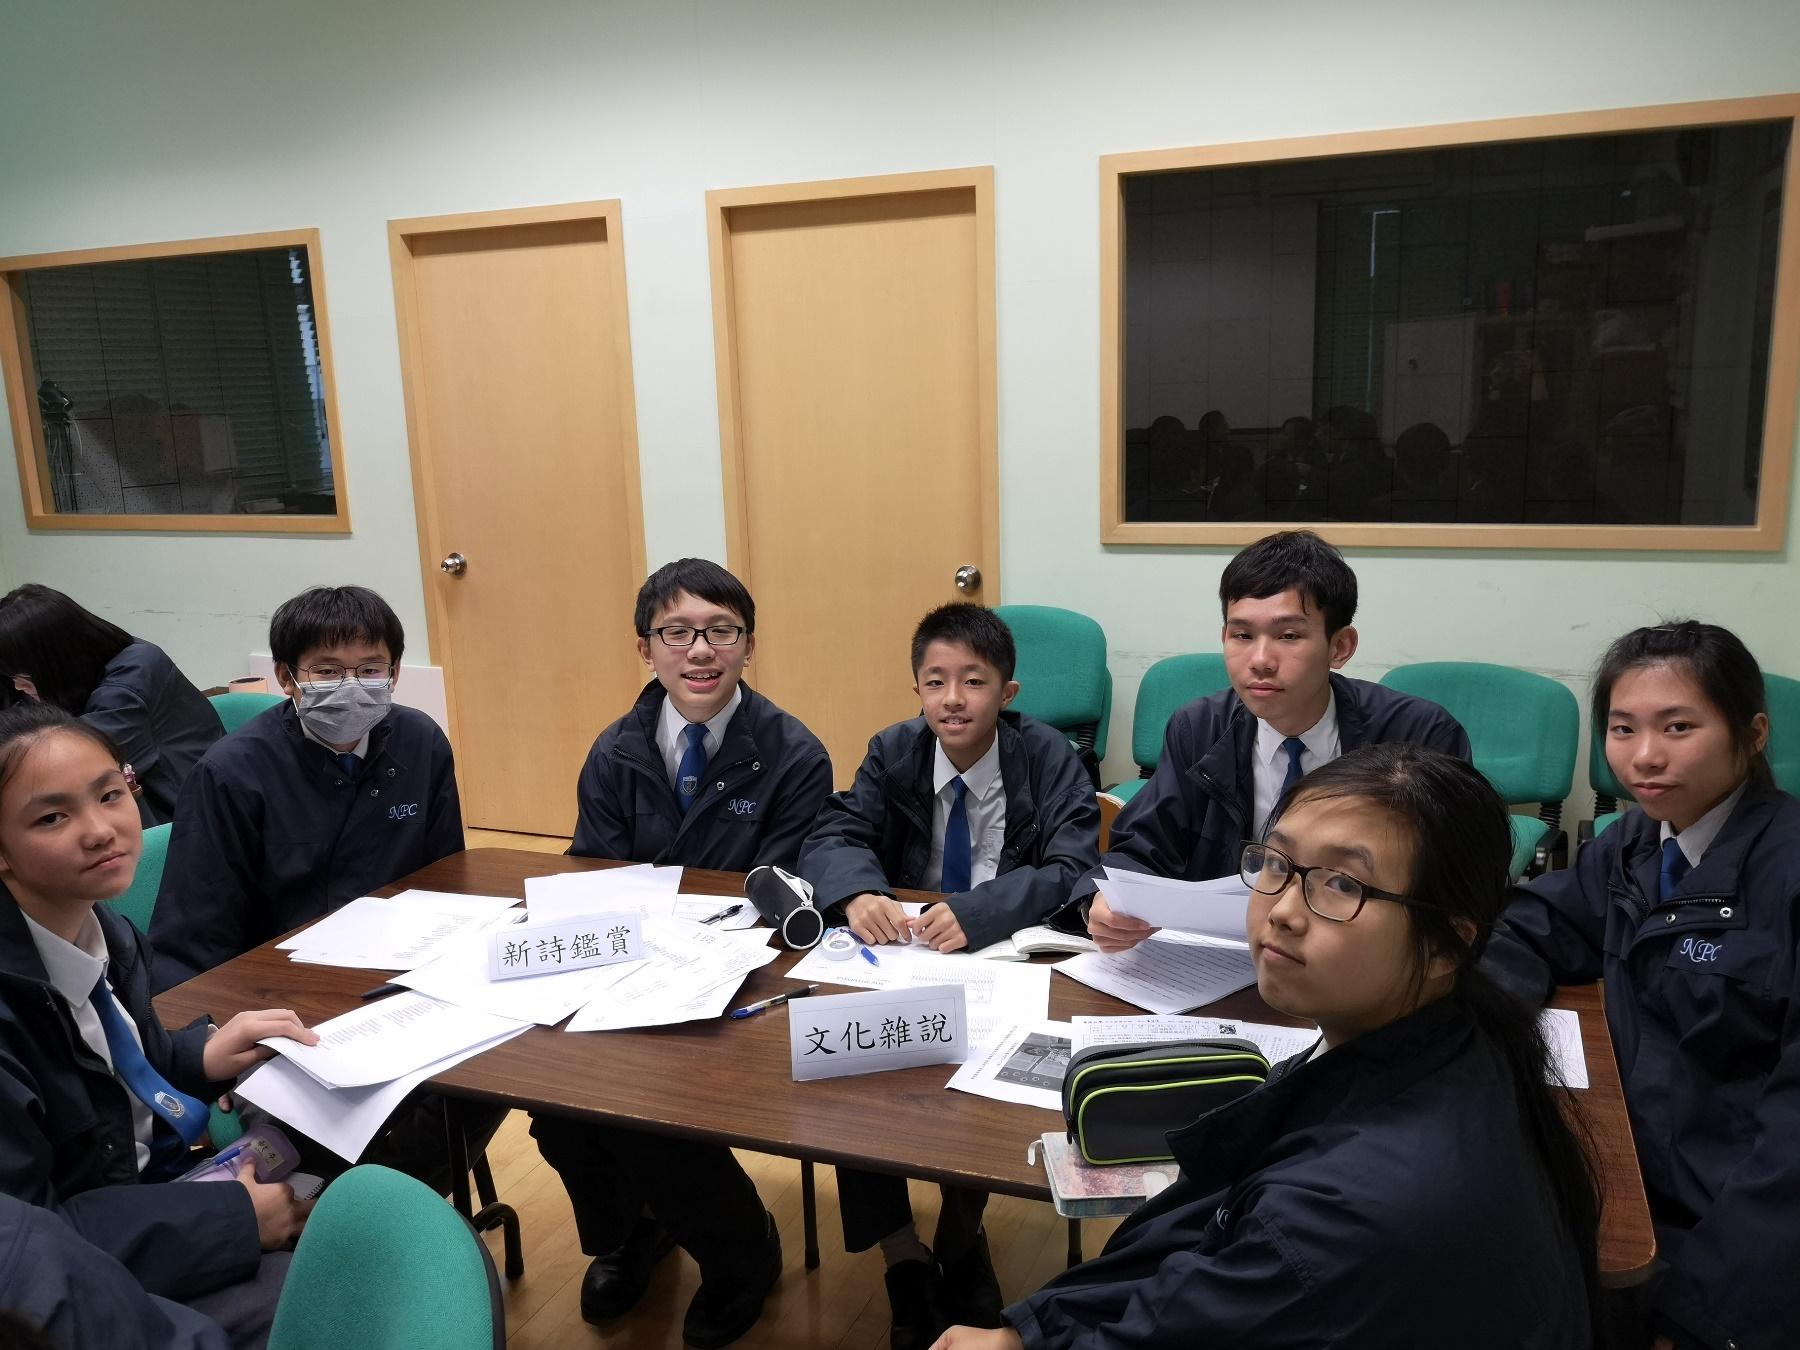 http://npc.edu.hk/sites/default/files/img_20190225_164945.jpg